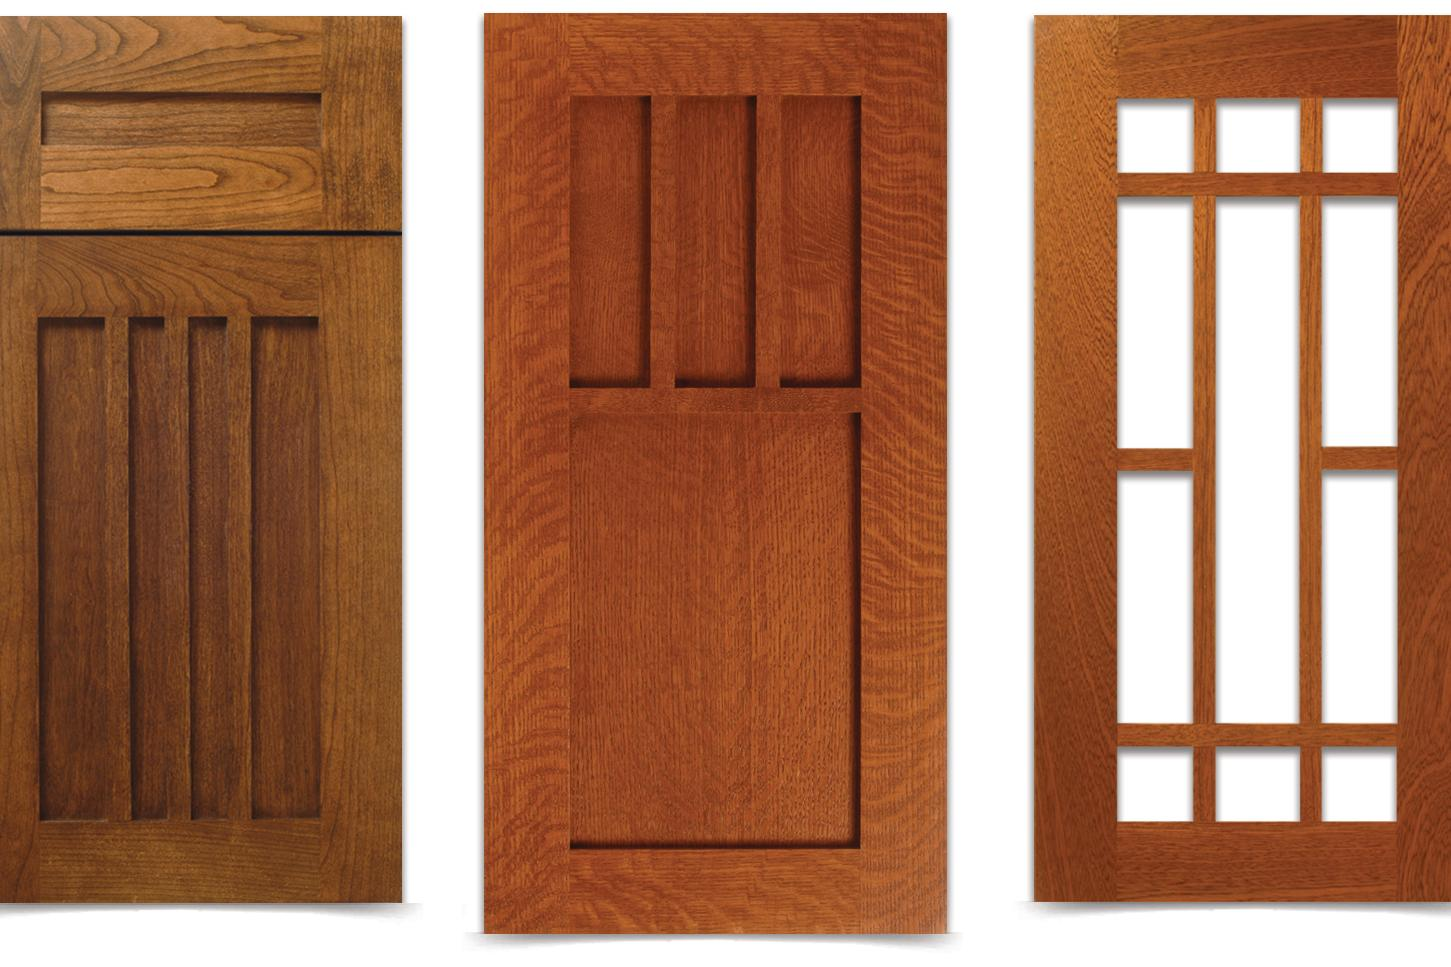 endless options walzcraft custom cabinet doors remodeling cabinets kitchen doors casework walzcraft